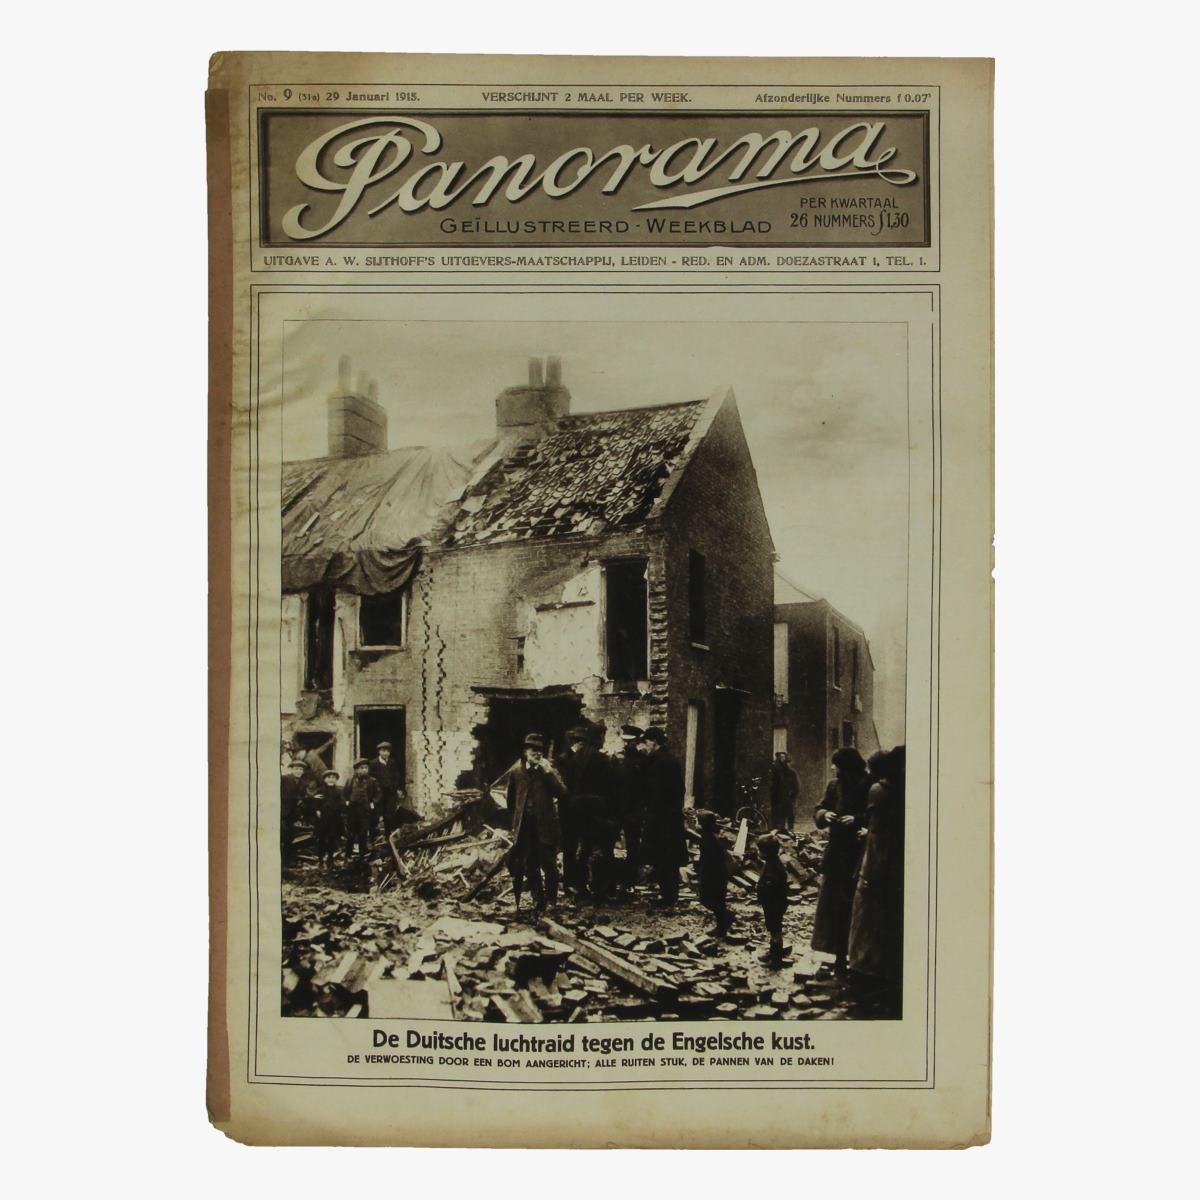 Afbeeldingen van oude weekblad panorama N°9  29 januari 1915